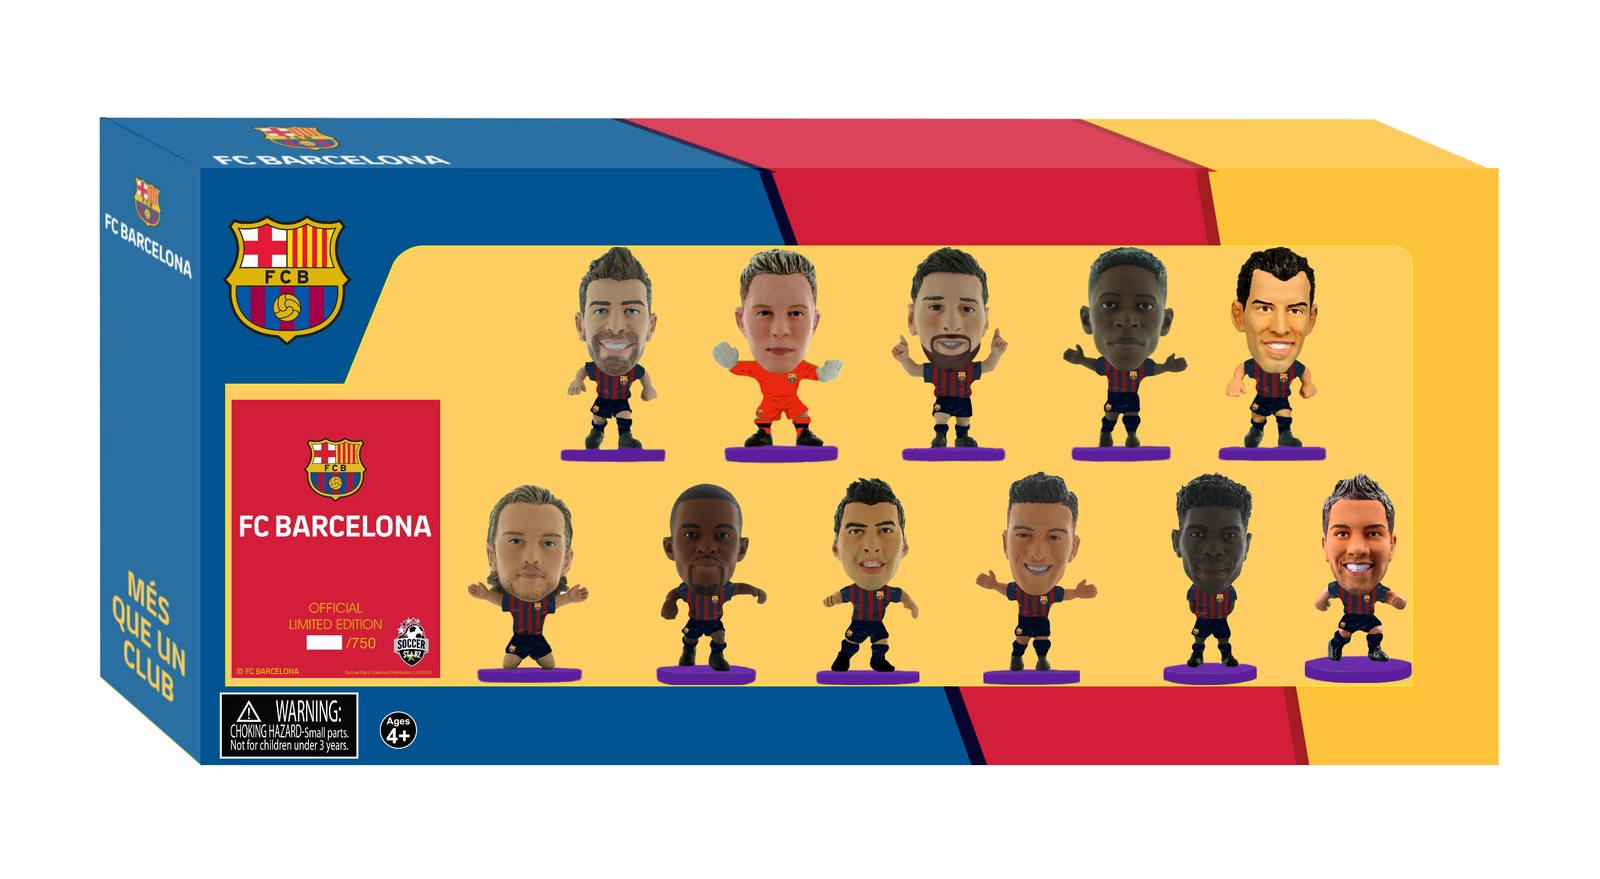 Фигурка Soccerstarz Набор футболистов ФК Барселона Barcelona Team Pack 11 players 2018/19, 404689 цена в Москве и Питере